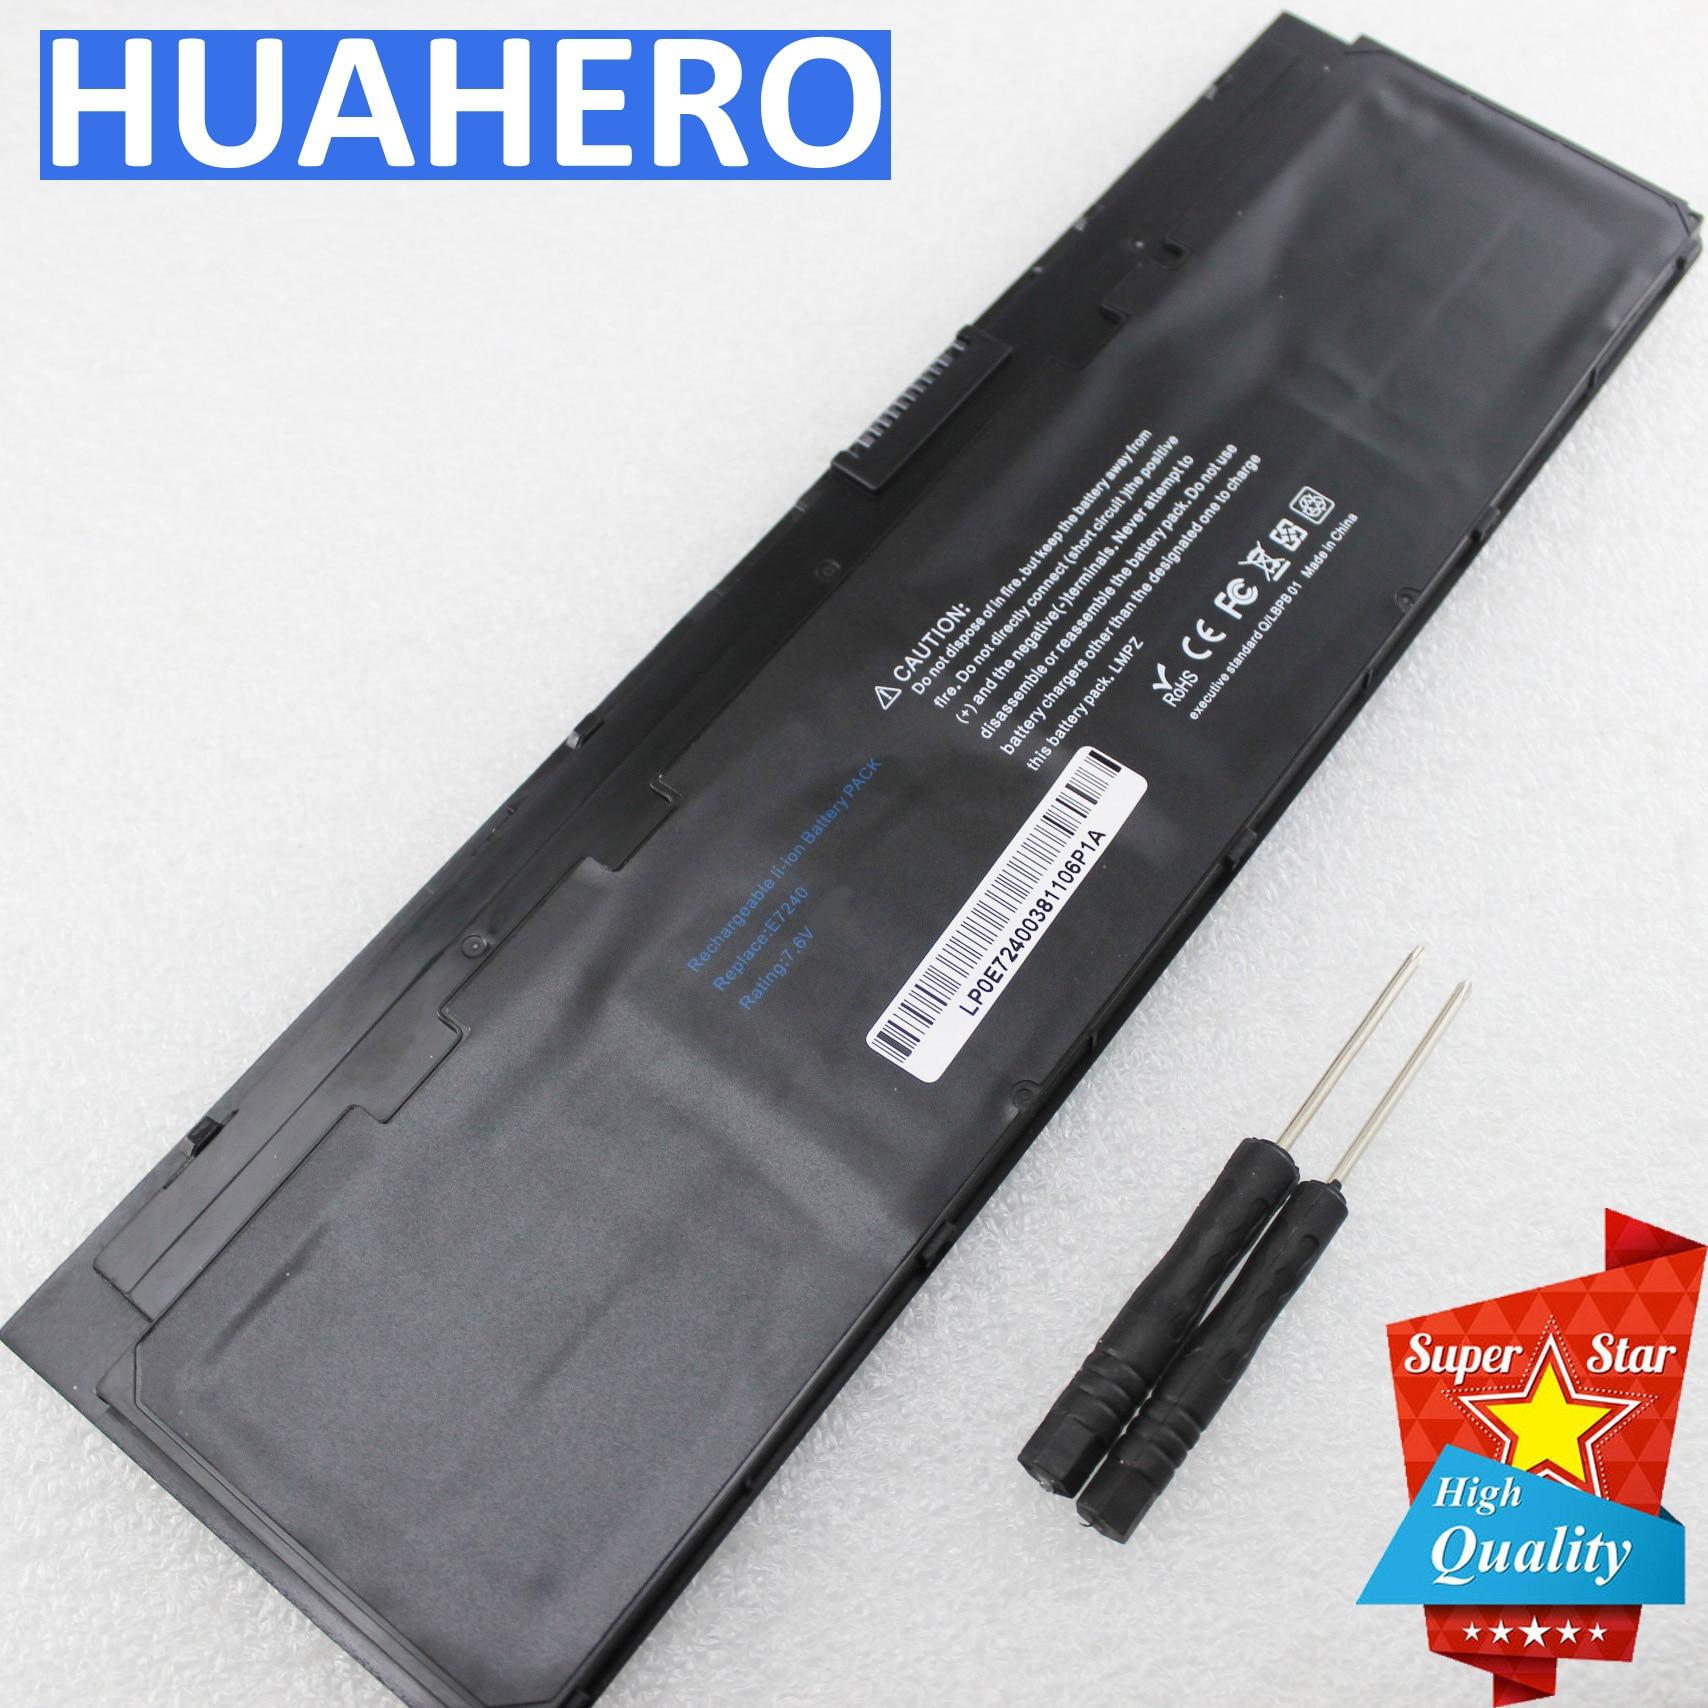 Bateria para Dell Latitude E7240 E7250 LAPTOP VFV59 F3G33 KKHY1 451-BBFW 451-BBFX WD52H J31N7 PT1 W57CV GVD76 HJ8KP NCVF0